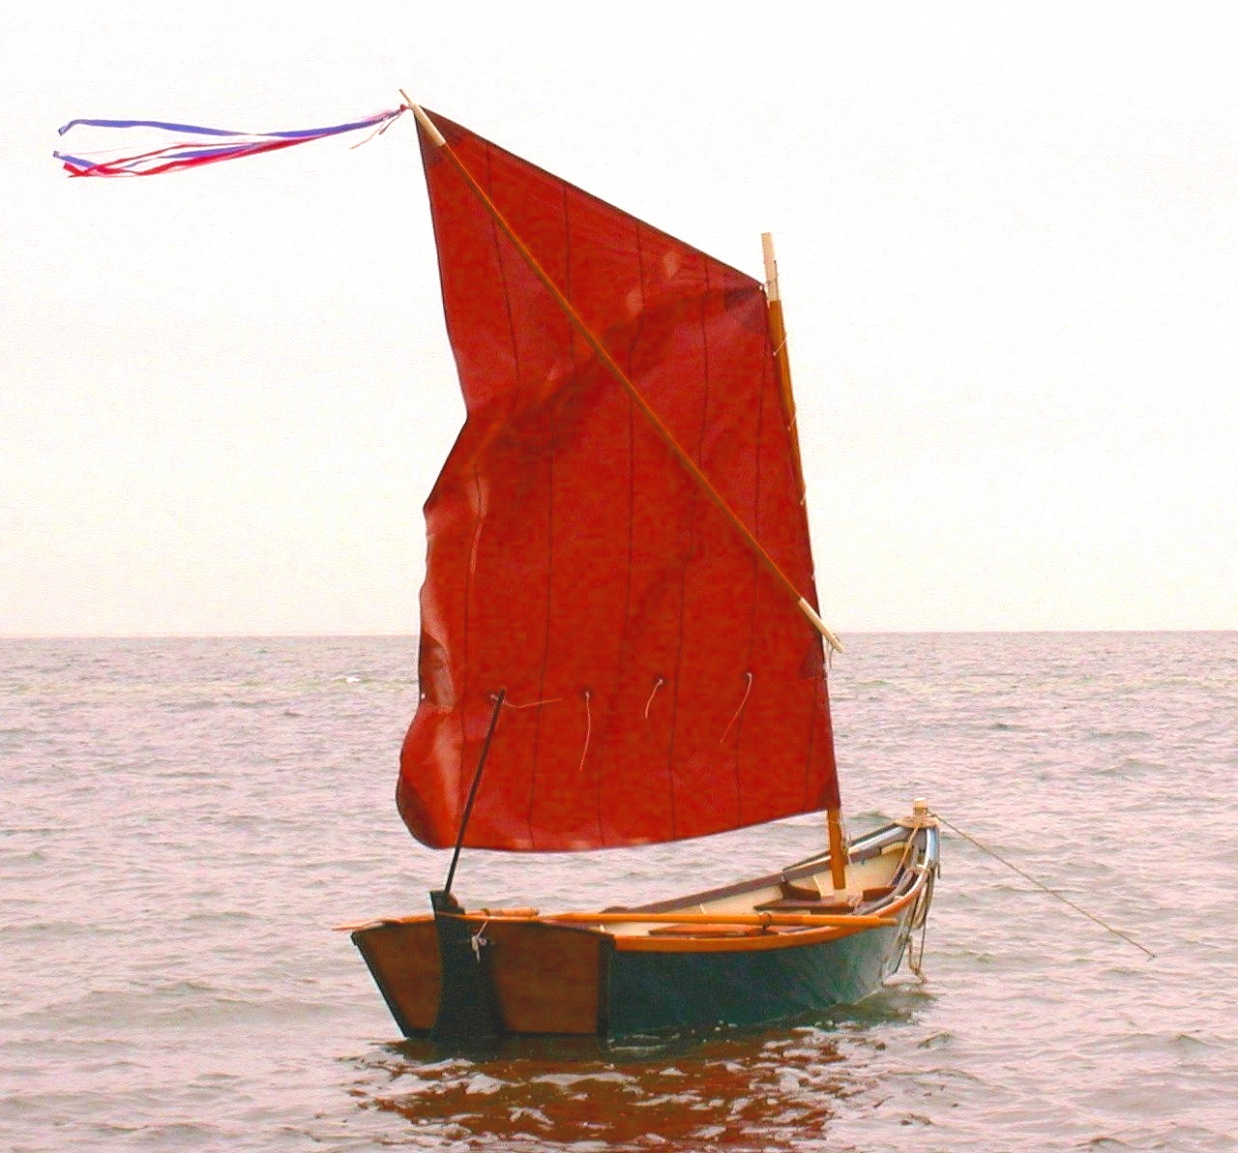 Click image for larger version  Name:Skiff Nantucket Sound 04'.jpg Views:87 Size:397.1 KB ID:18129